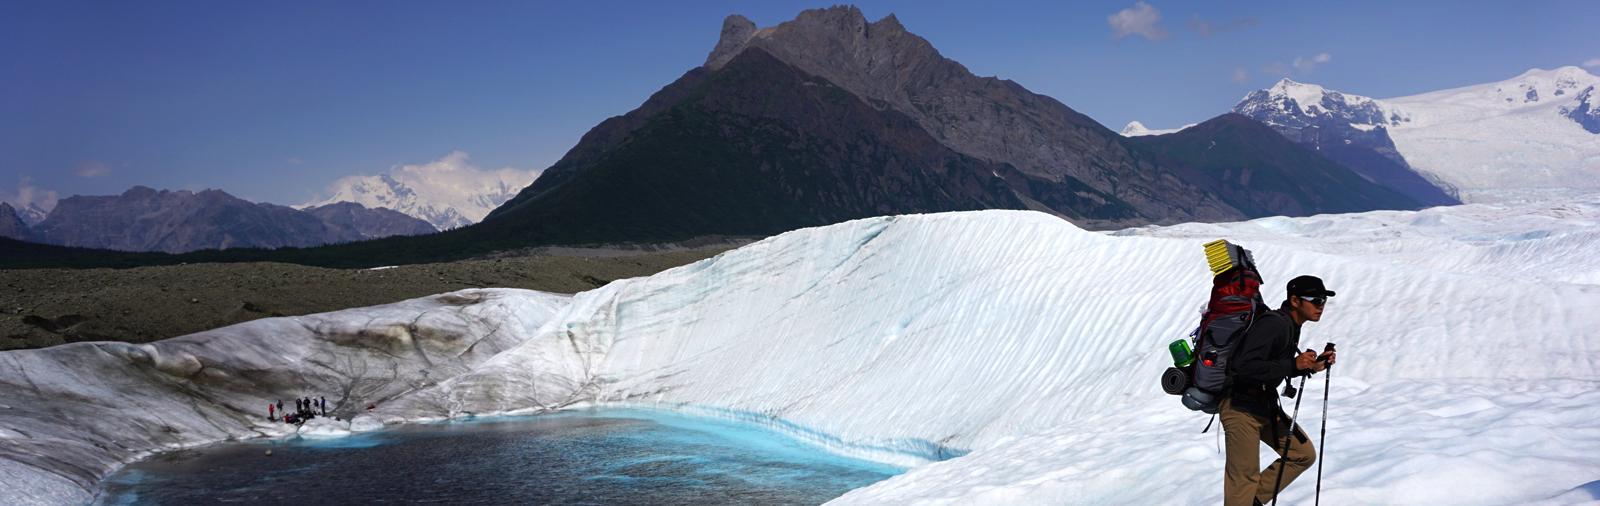 Alaska Backpacking Trip Donoho Lakes Glacier Hiking Trek Guided Alaska Hiking And Backpacking Adventures